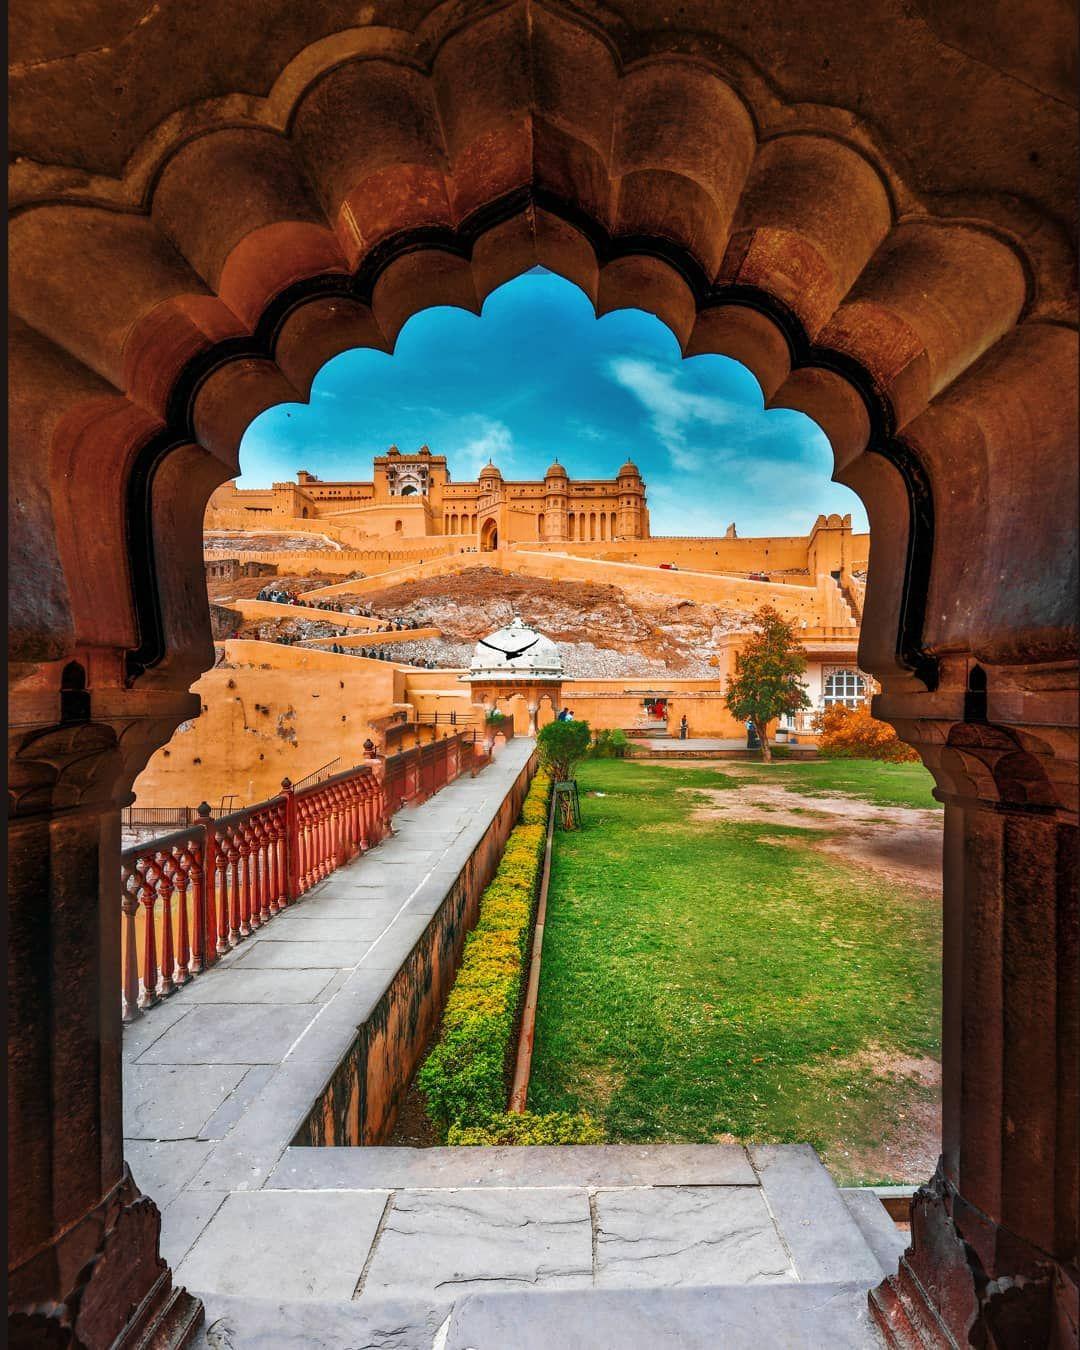 15 1k Likes 296 Comments Kartik A Photographer Gokartik On Instagram Gate To Grandeur Amer Fort Jaipur Amer Fort Grandeur Instagram